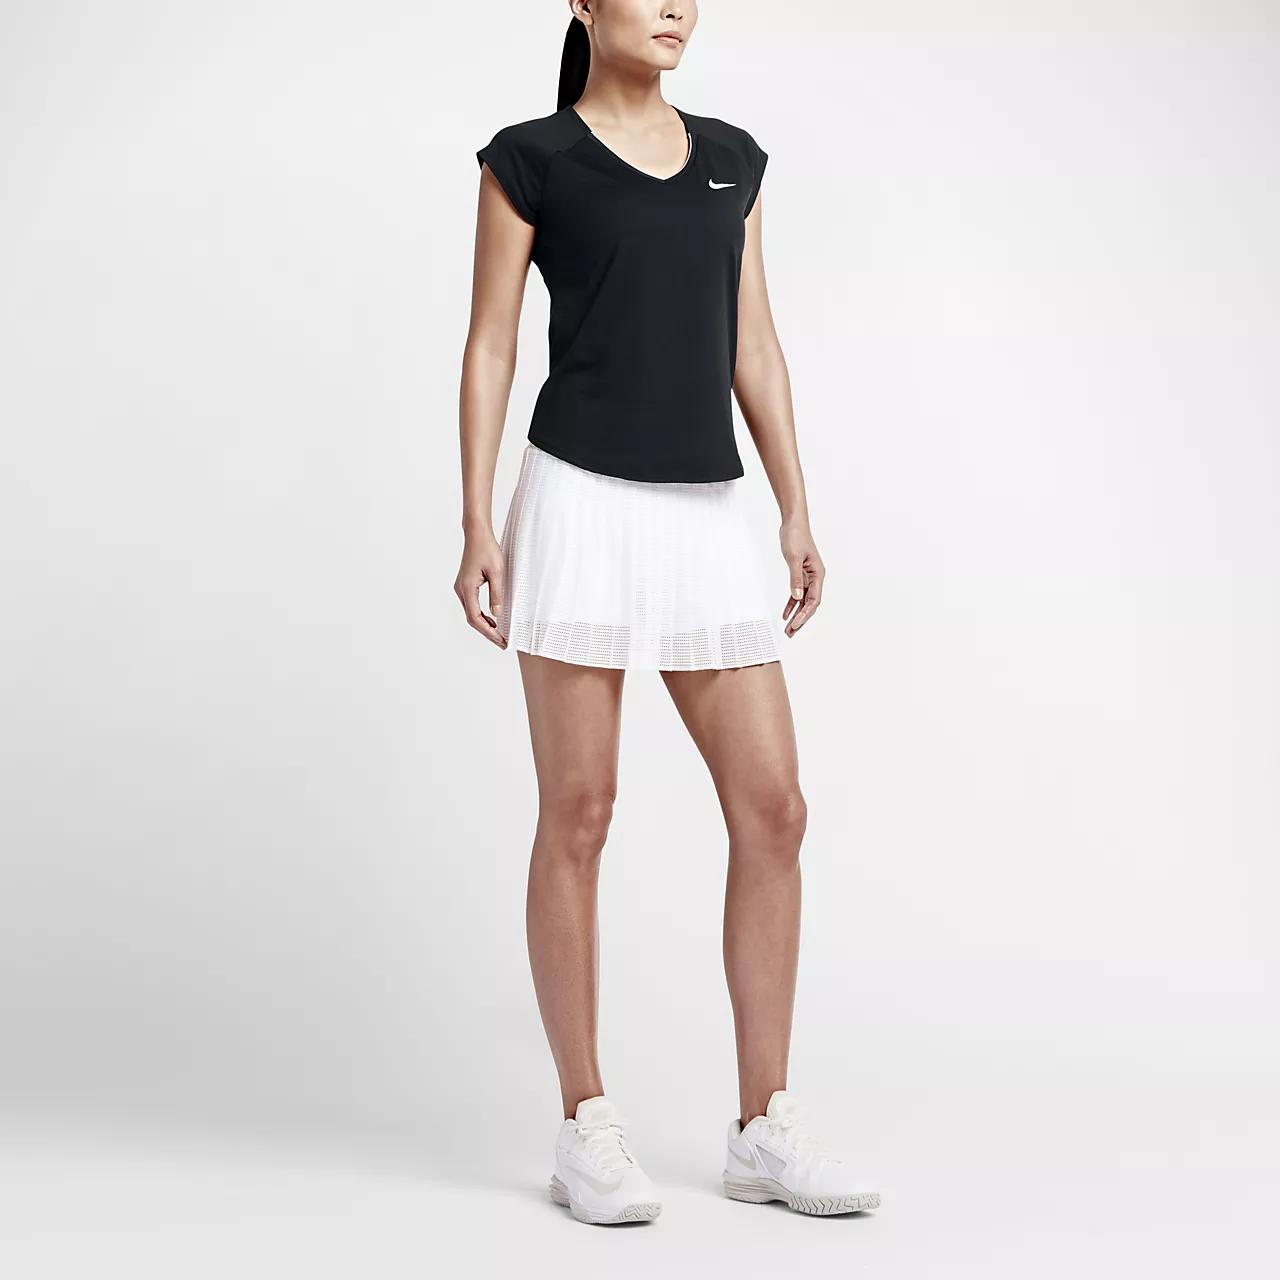 NikeCourt Pure Women's Tennis Top 728757-010